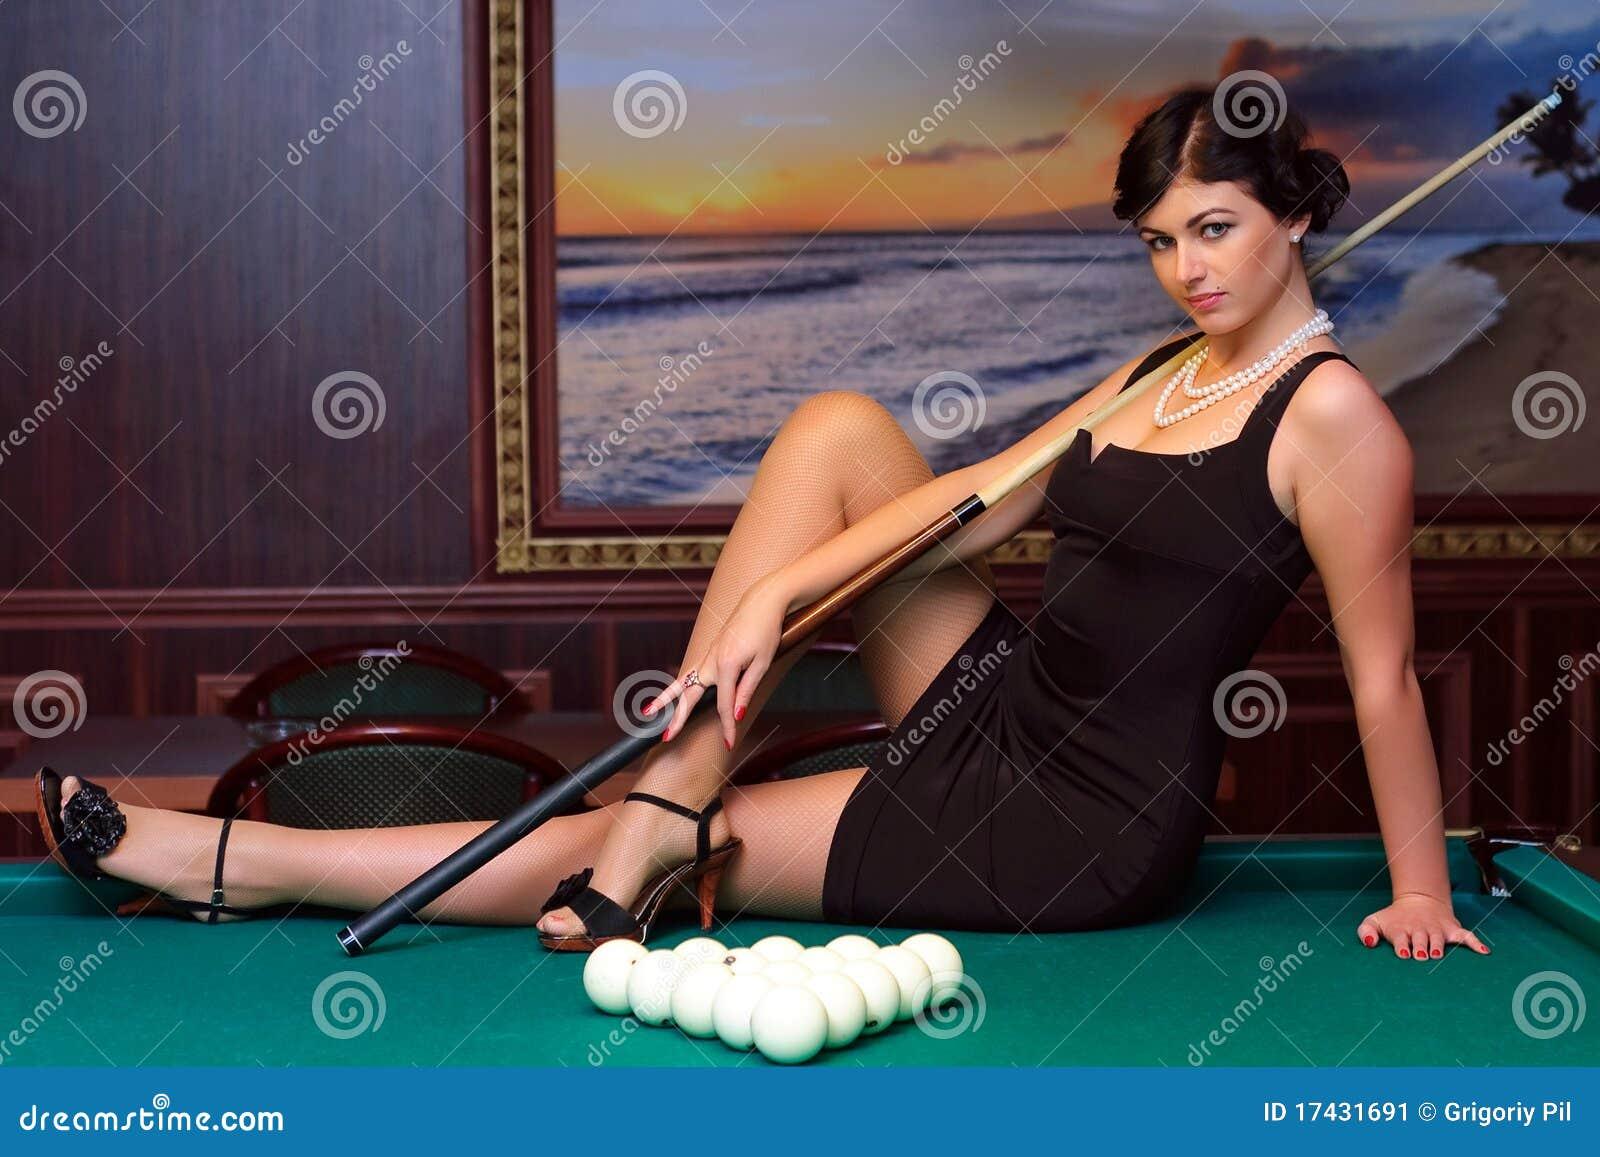 Ready to play billiards.